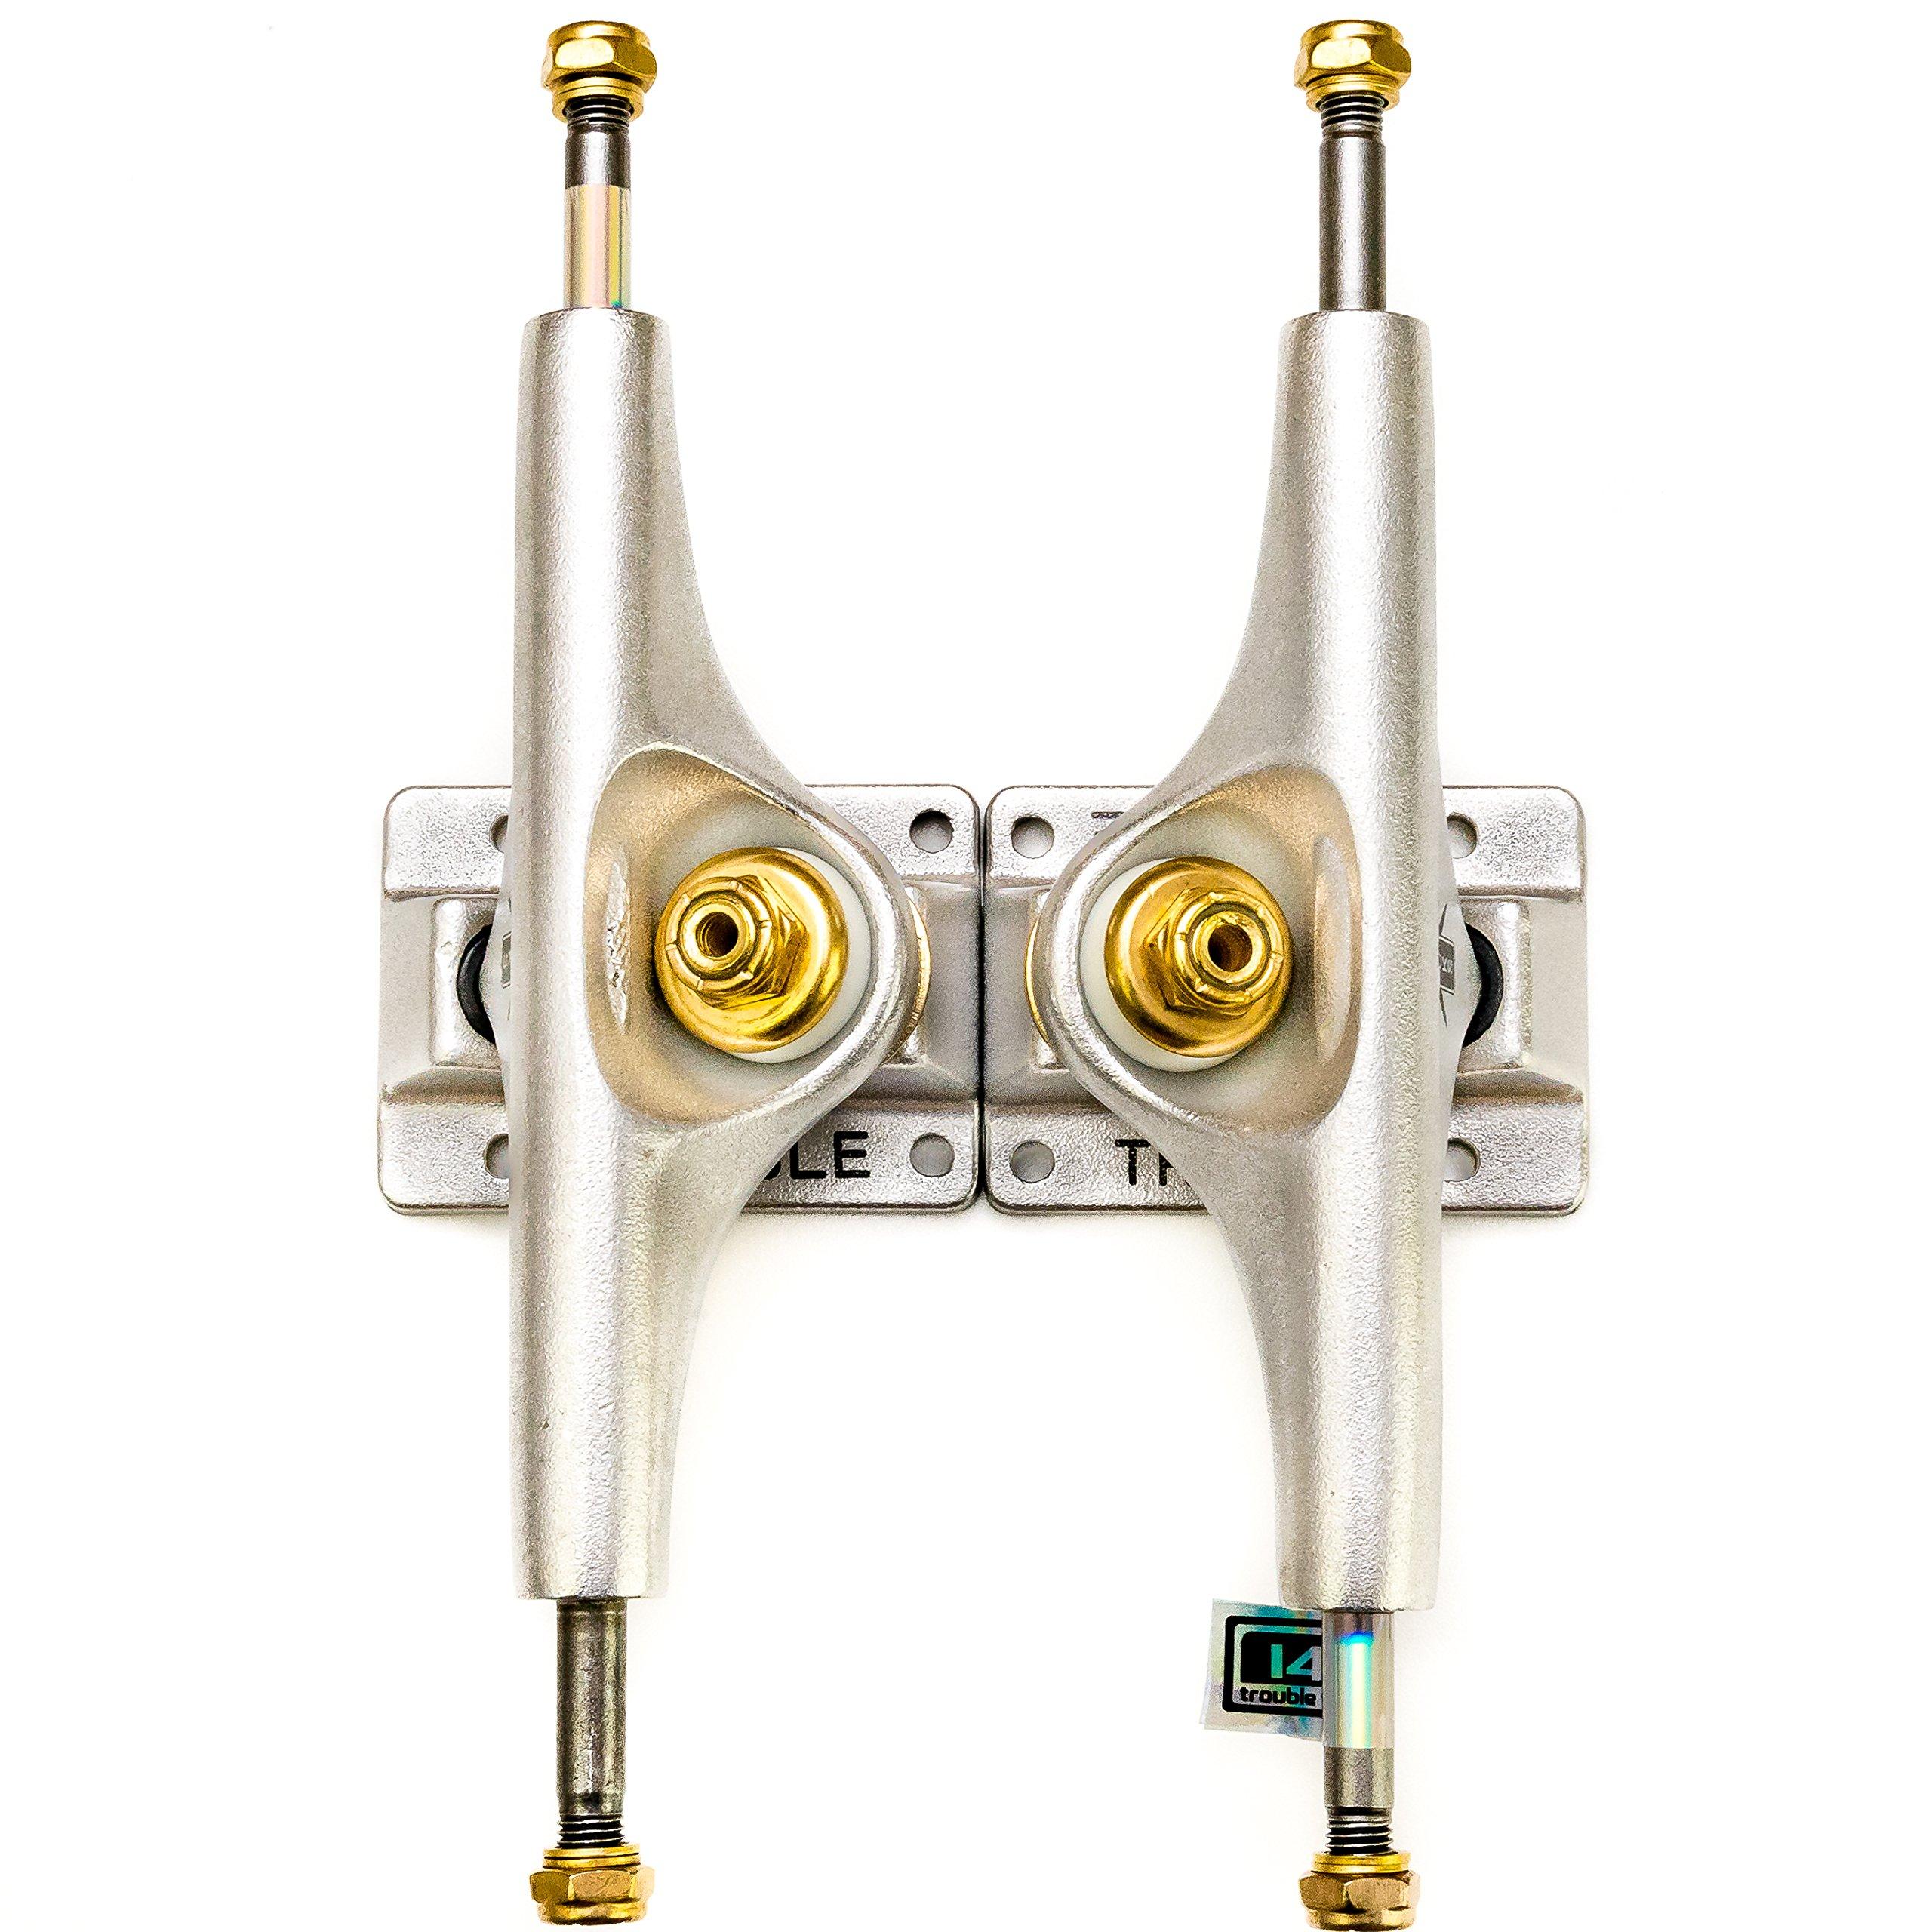 "Trouble Trucks Skateboard Truck Hollow Light 156mm Hanger 8.75/"" Axle T4 Matte Gold Silver Set of 2"